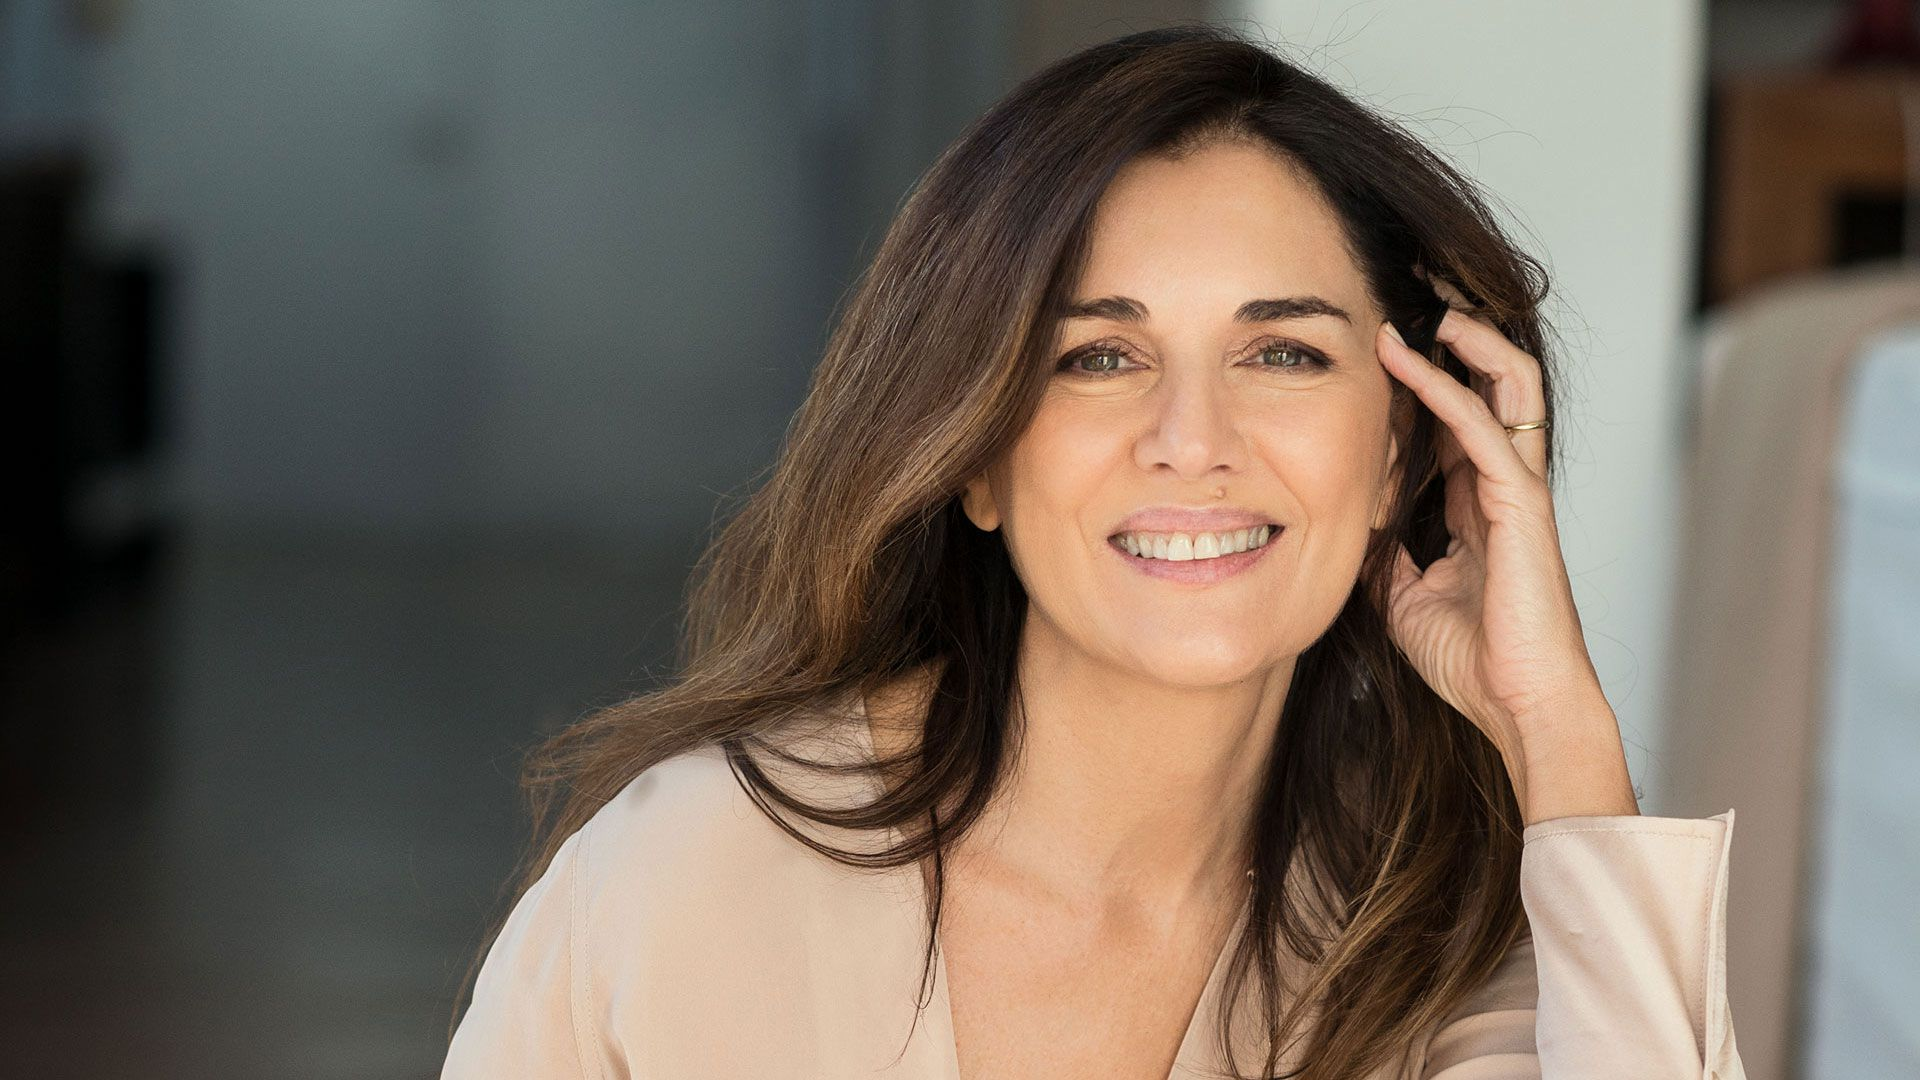 Andrea Frigerio (Foto: Claudia Cebrian)